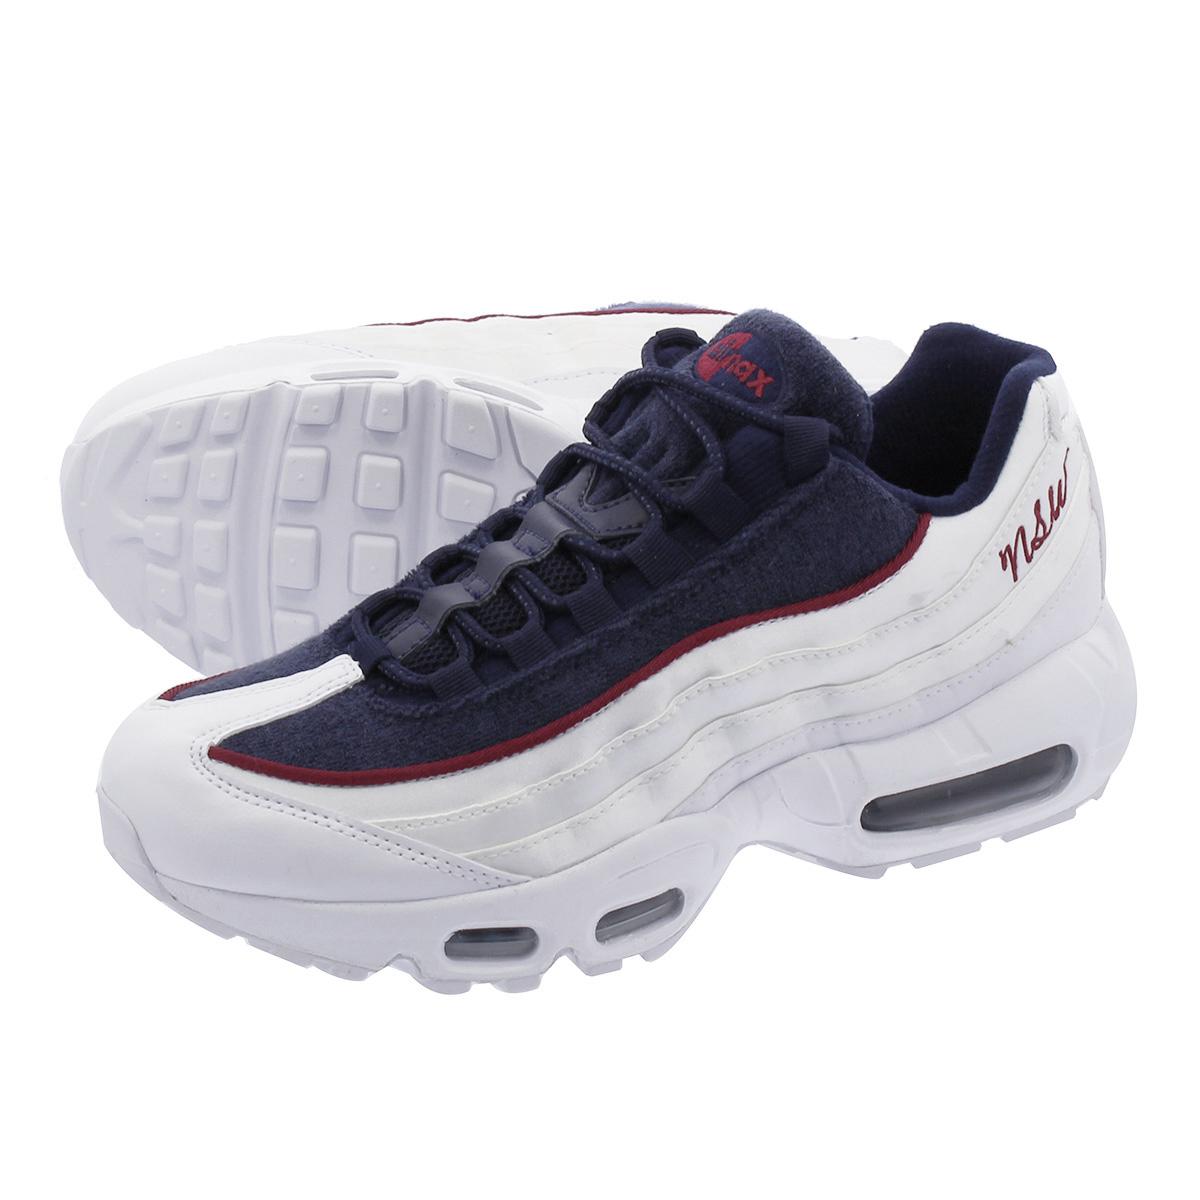 hot sale online d4927 aa018 NIKE WMNS AIR MAX 95 Nike women Air Max 95 LX WHITE/NAVY/BLACK aa1103-100